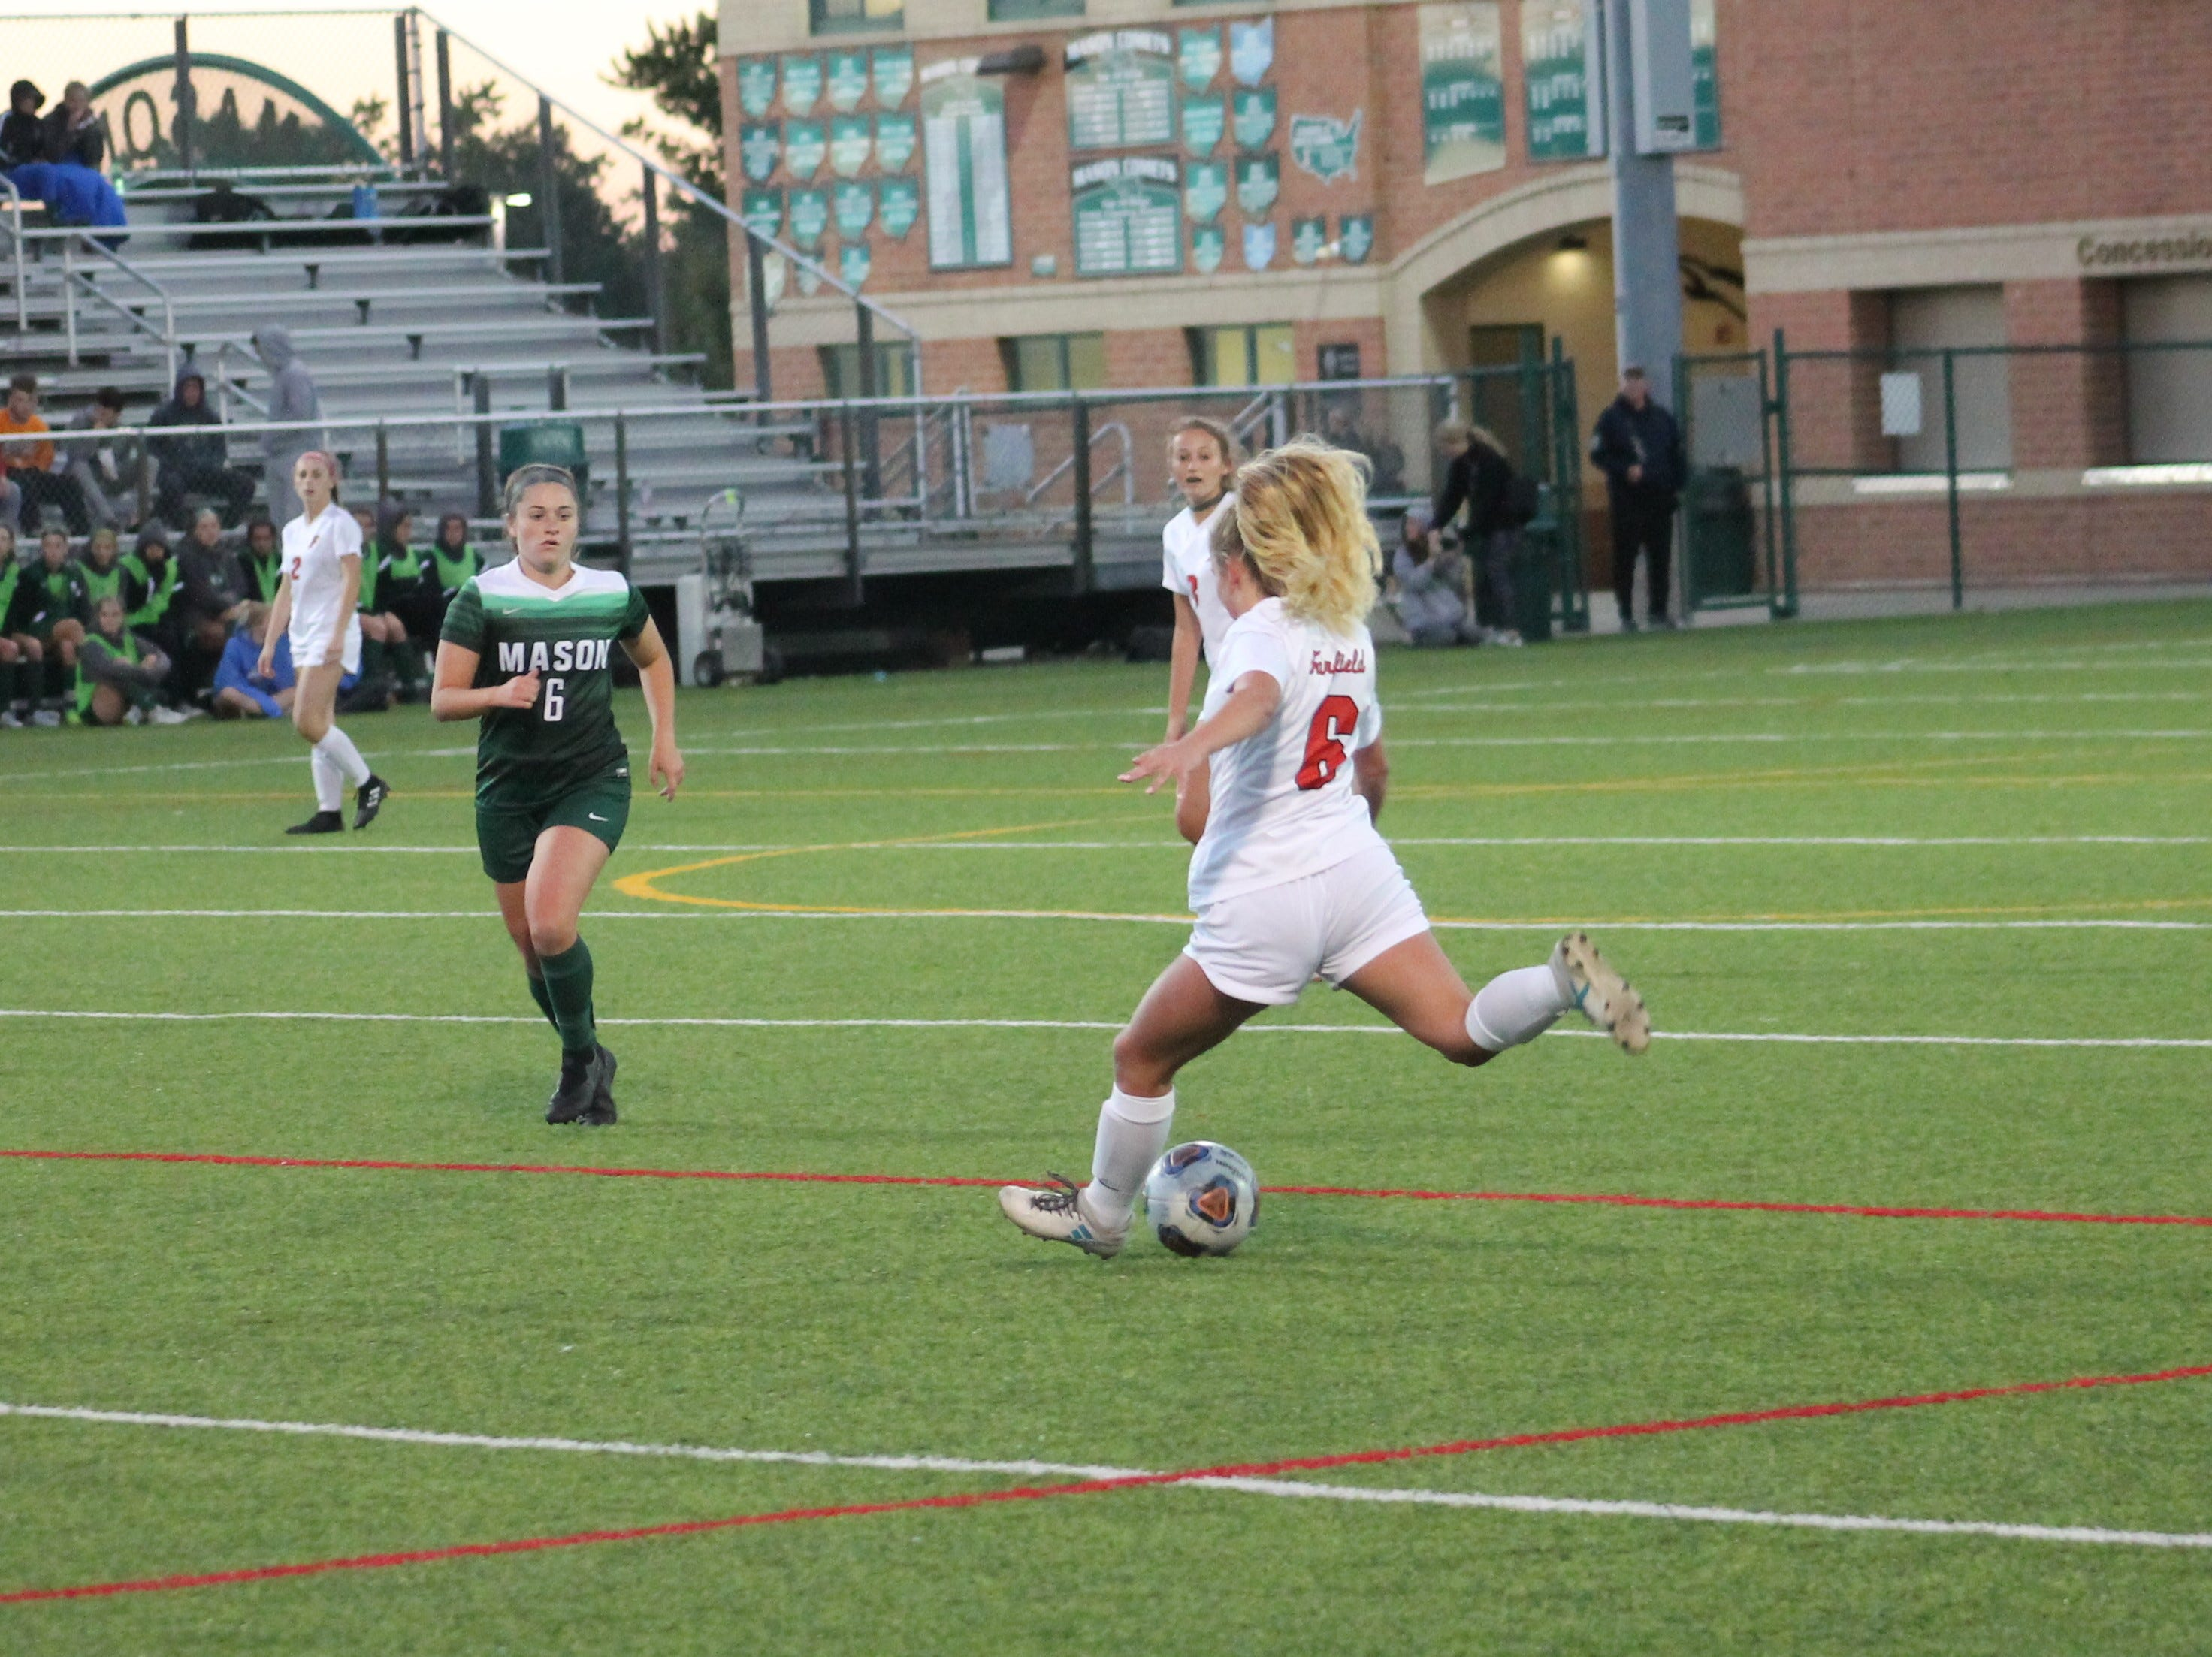 Fairfield senior Lily Welch cranks the ball upfield